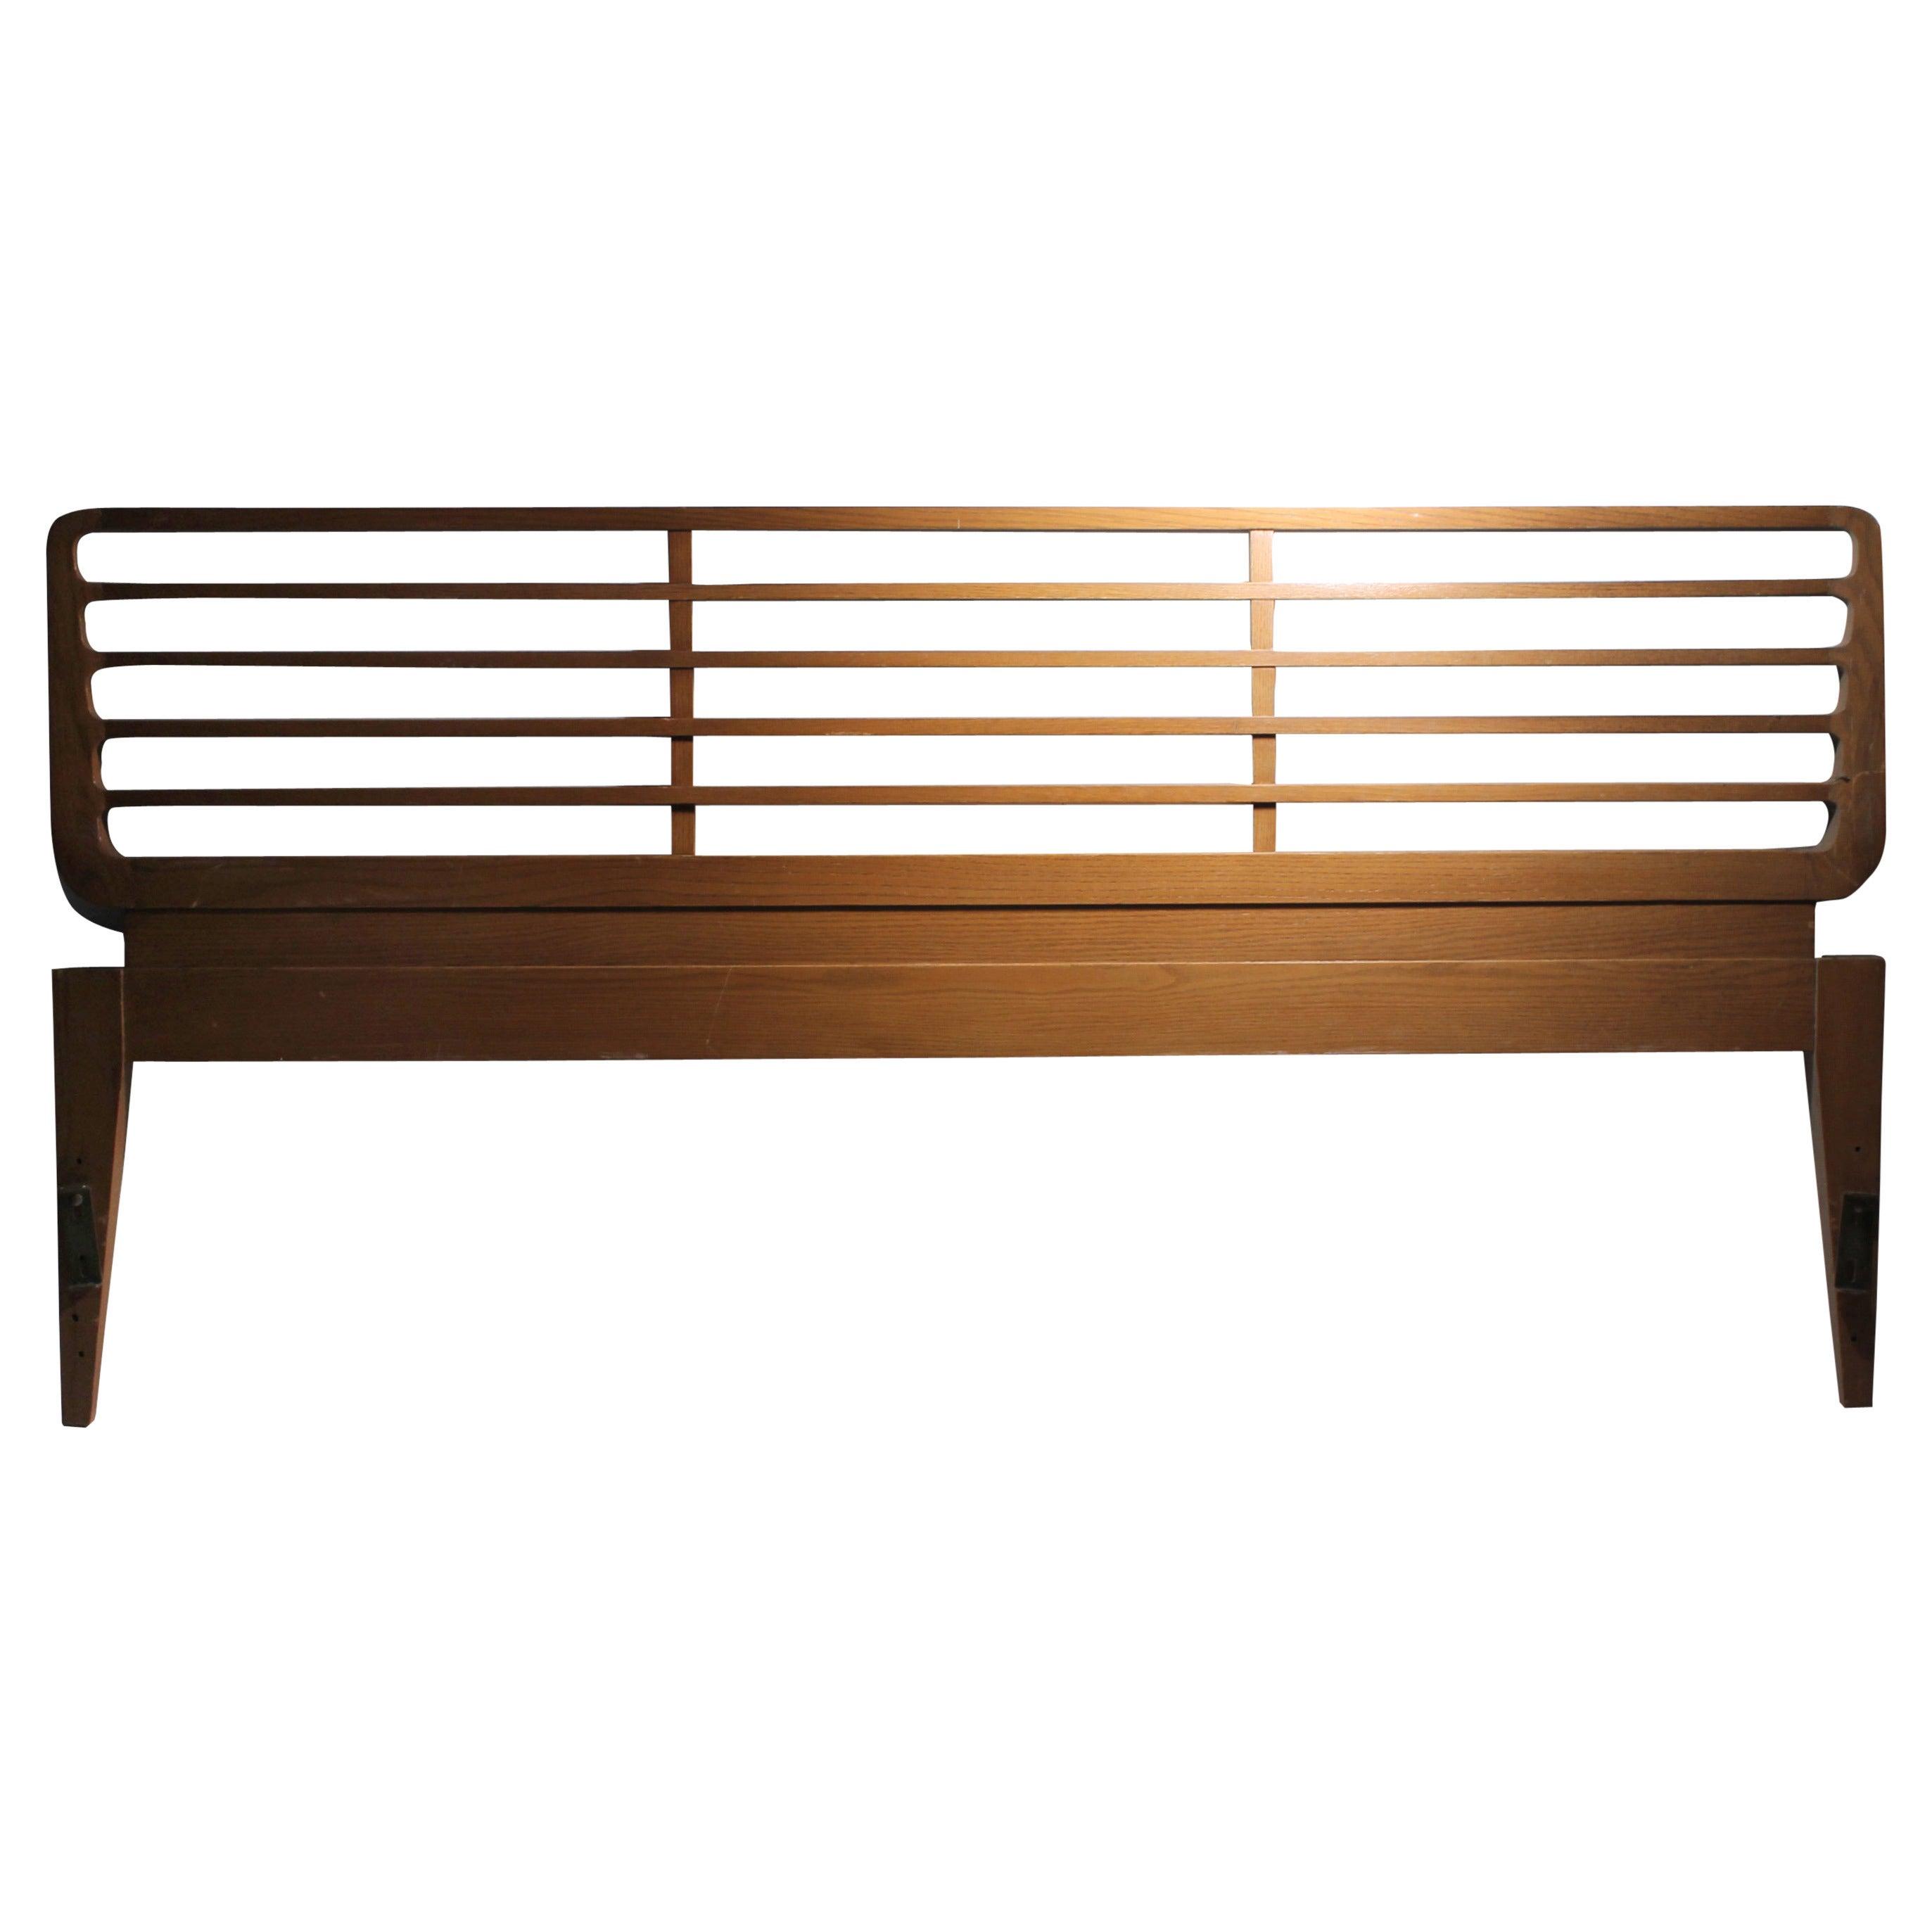 Rare Harold Schwartz Headboard Bed for Romweber